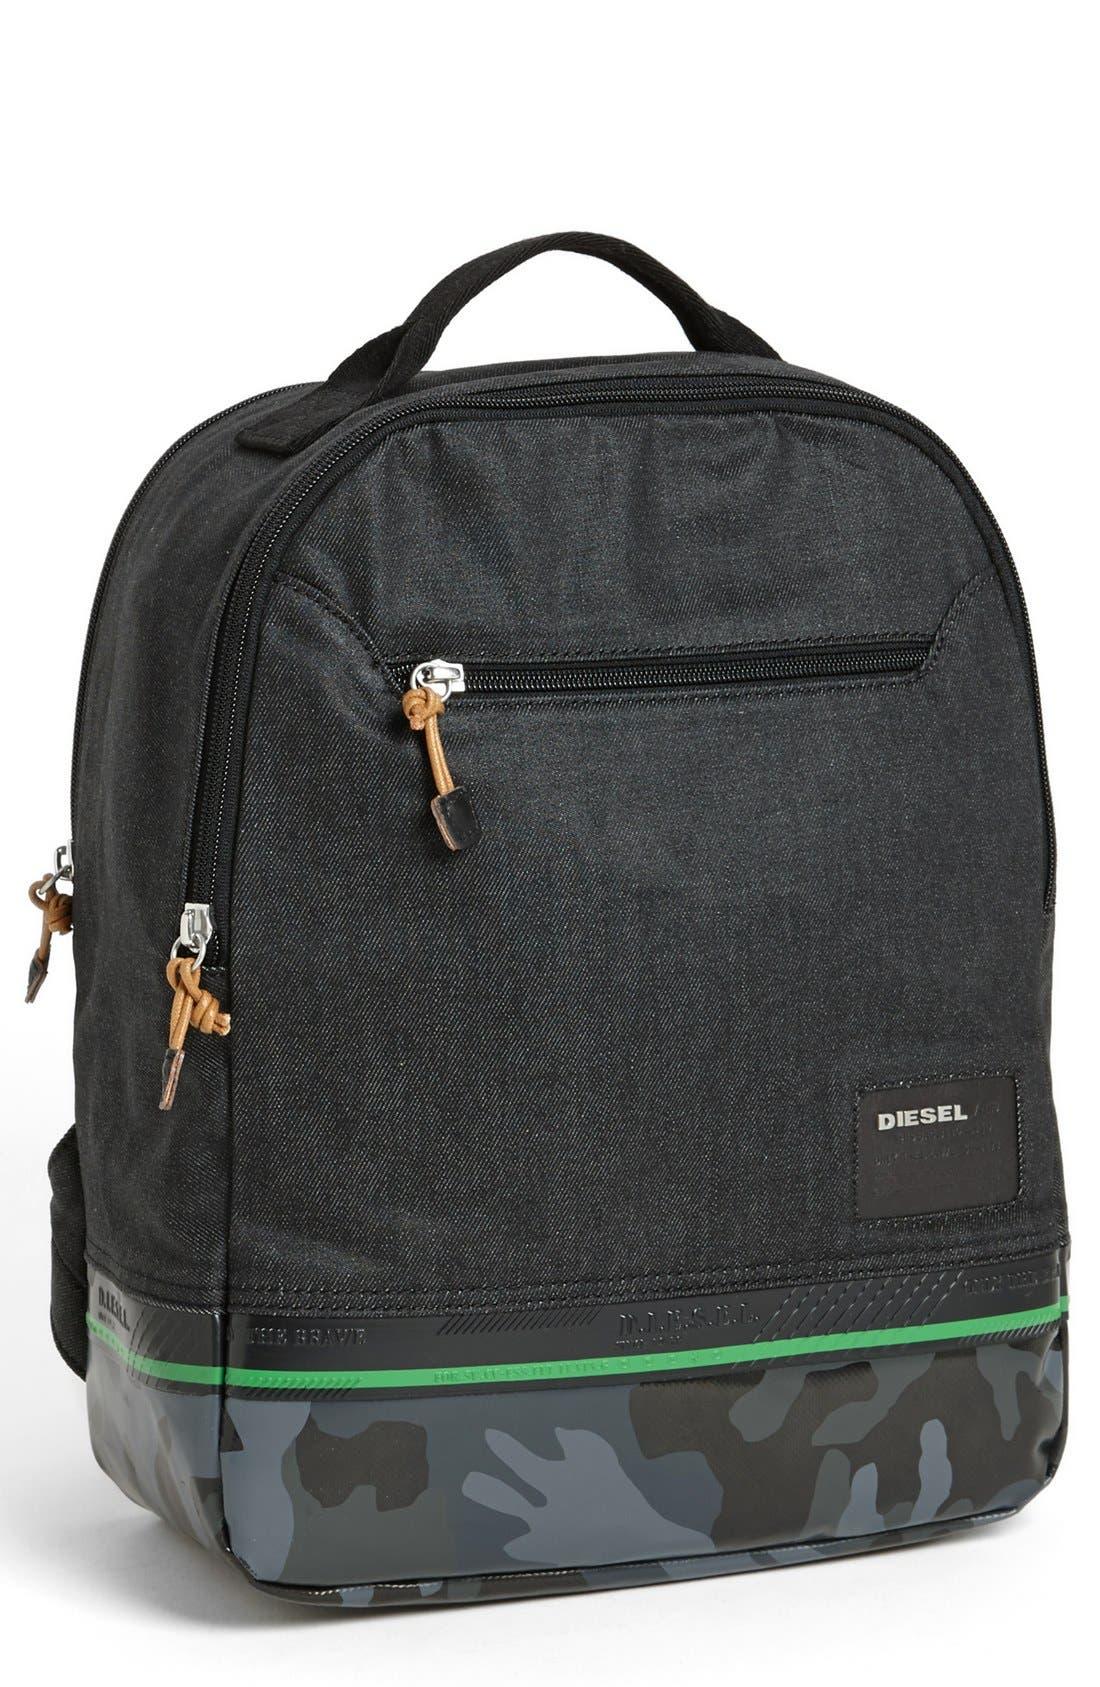 Alternate Image 1 Selected - DIESEL® 'Rubber Games' Backpack